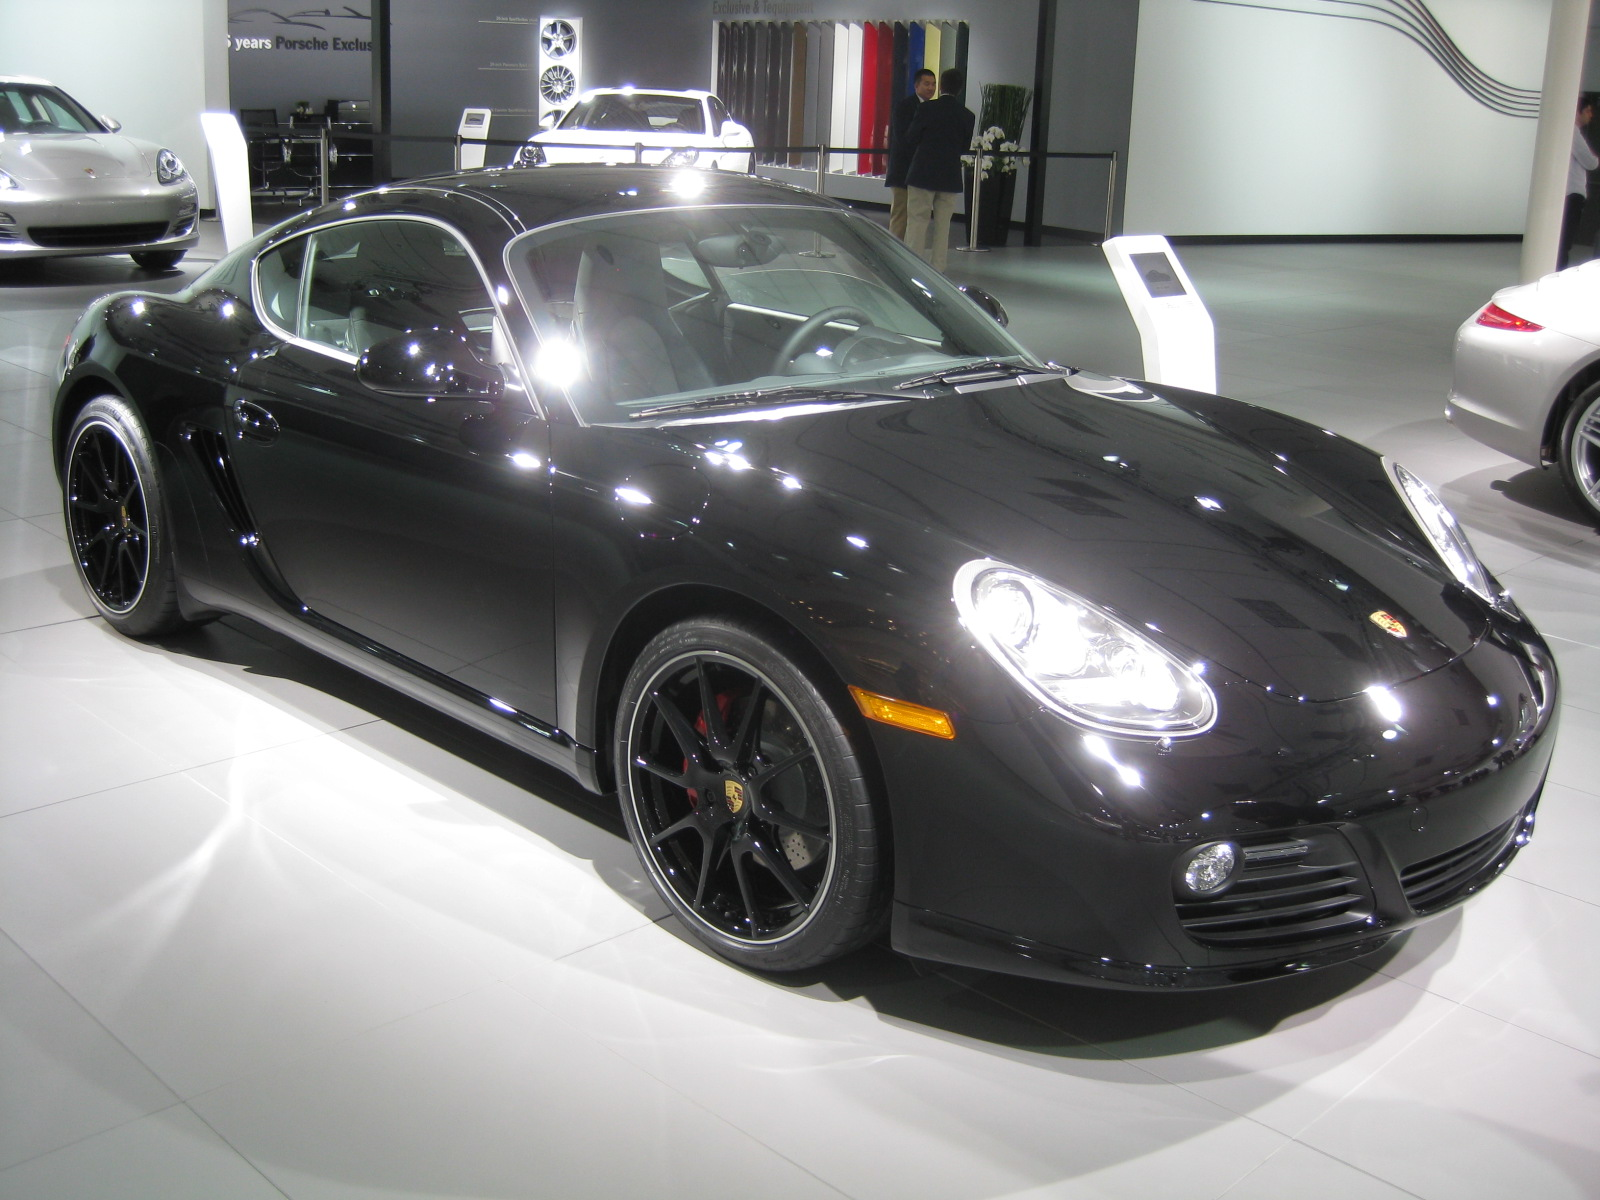 Black Porsche Car 2012 2012 Porsche Cayman s Black